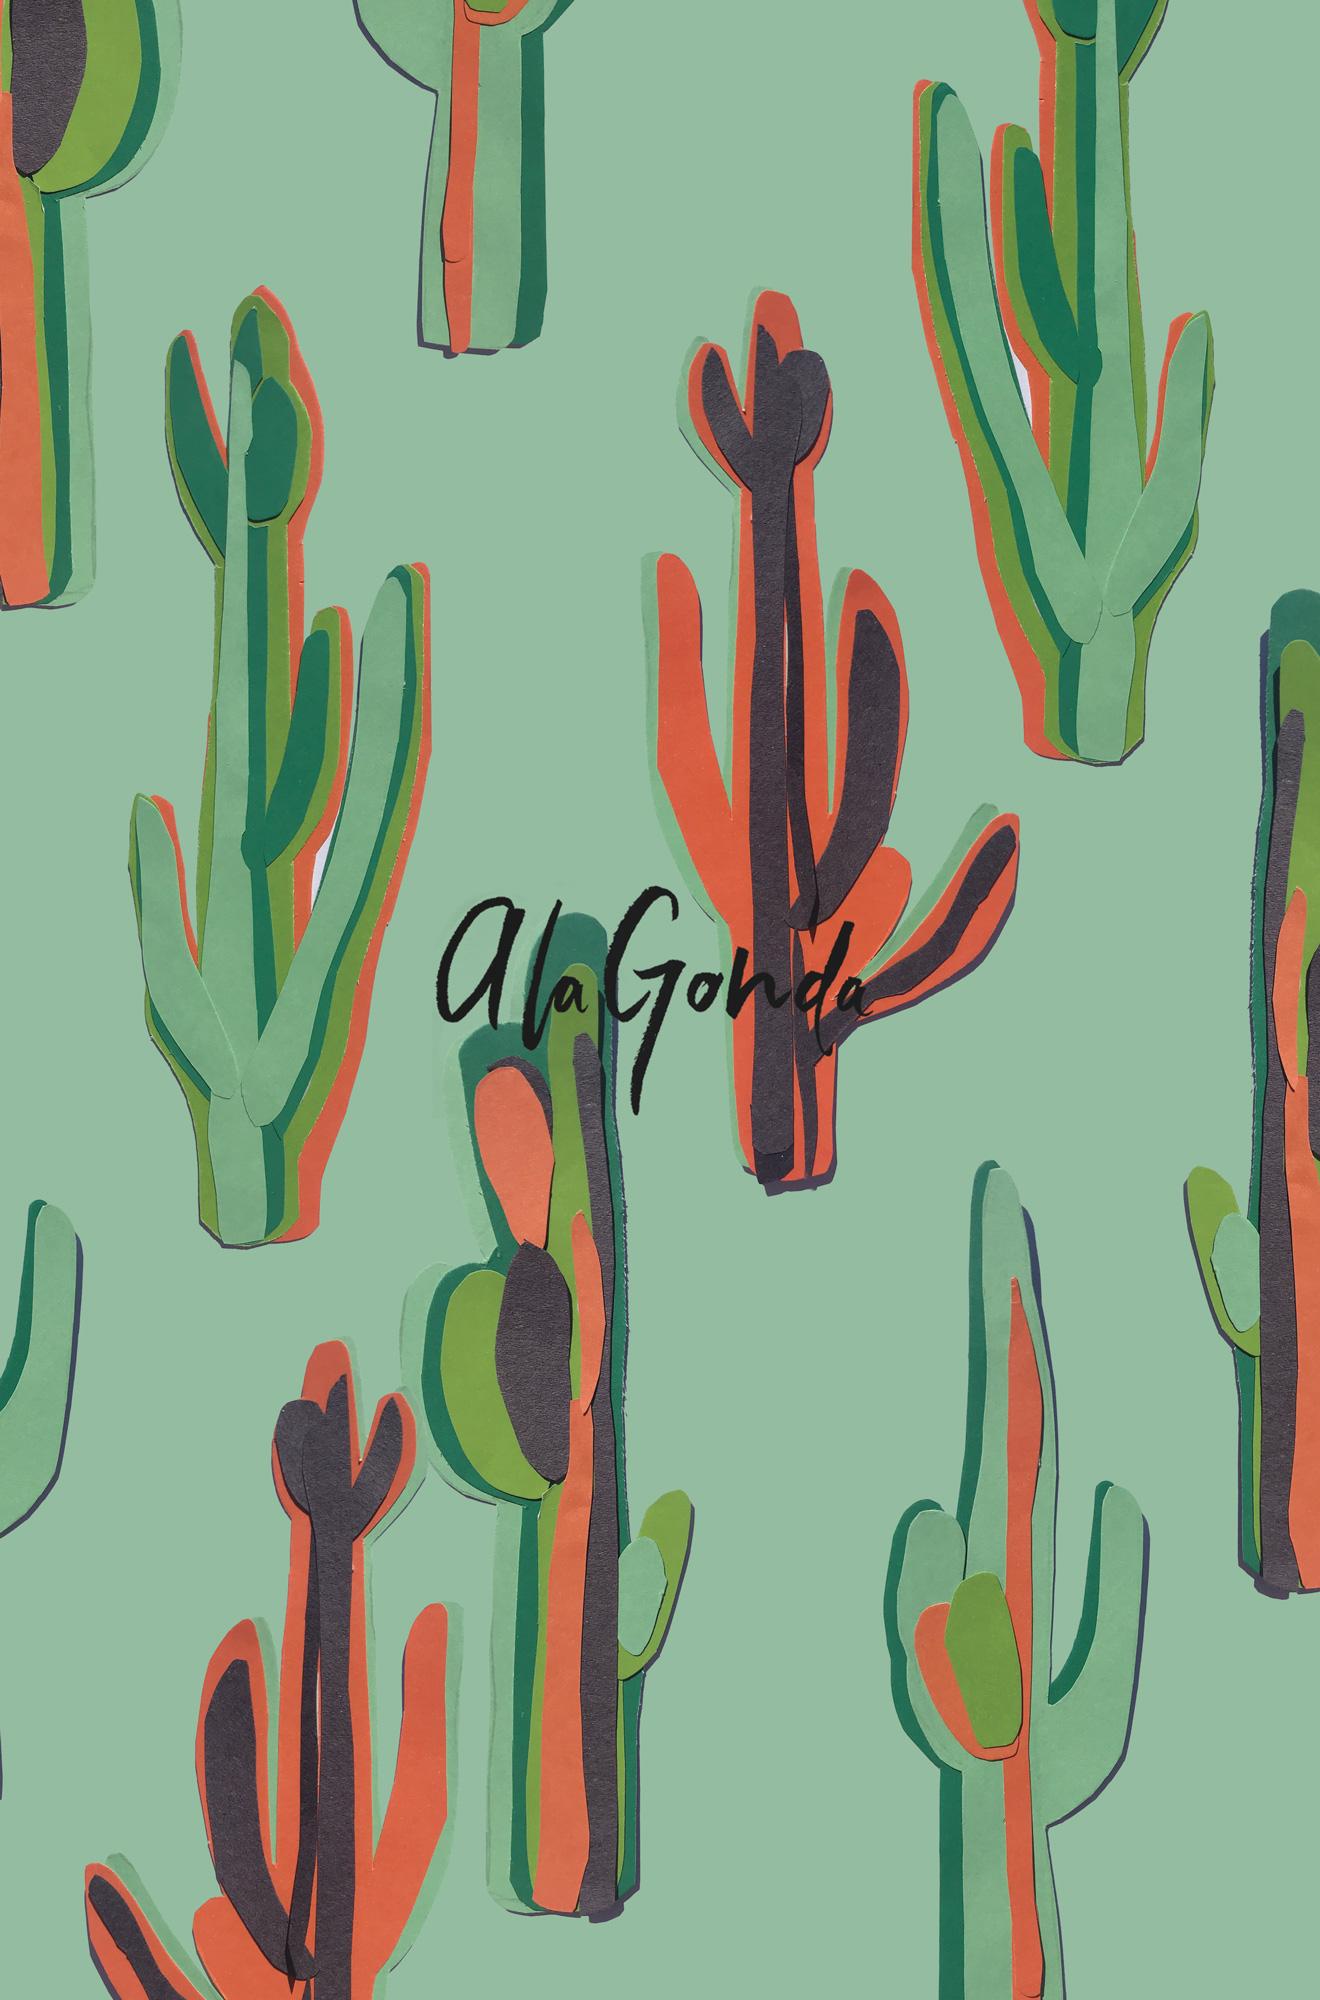 alagonda-tree-of-the-white-desert